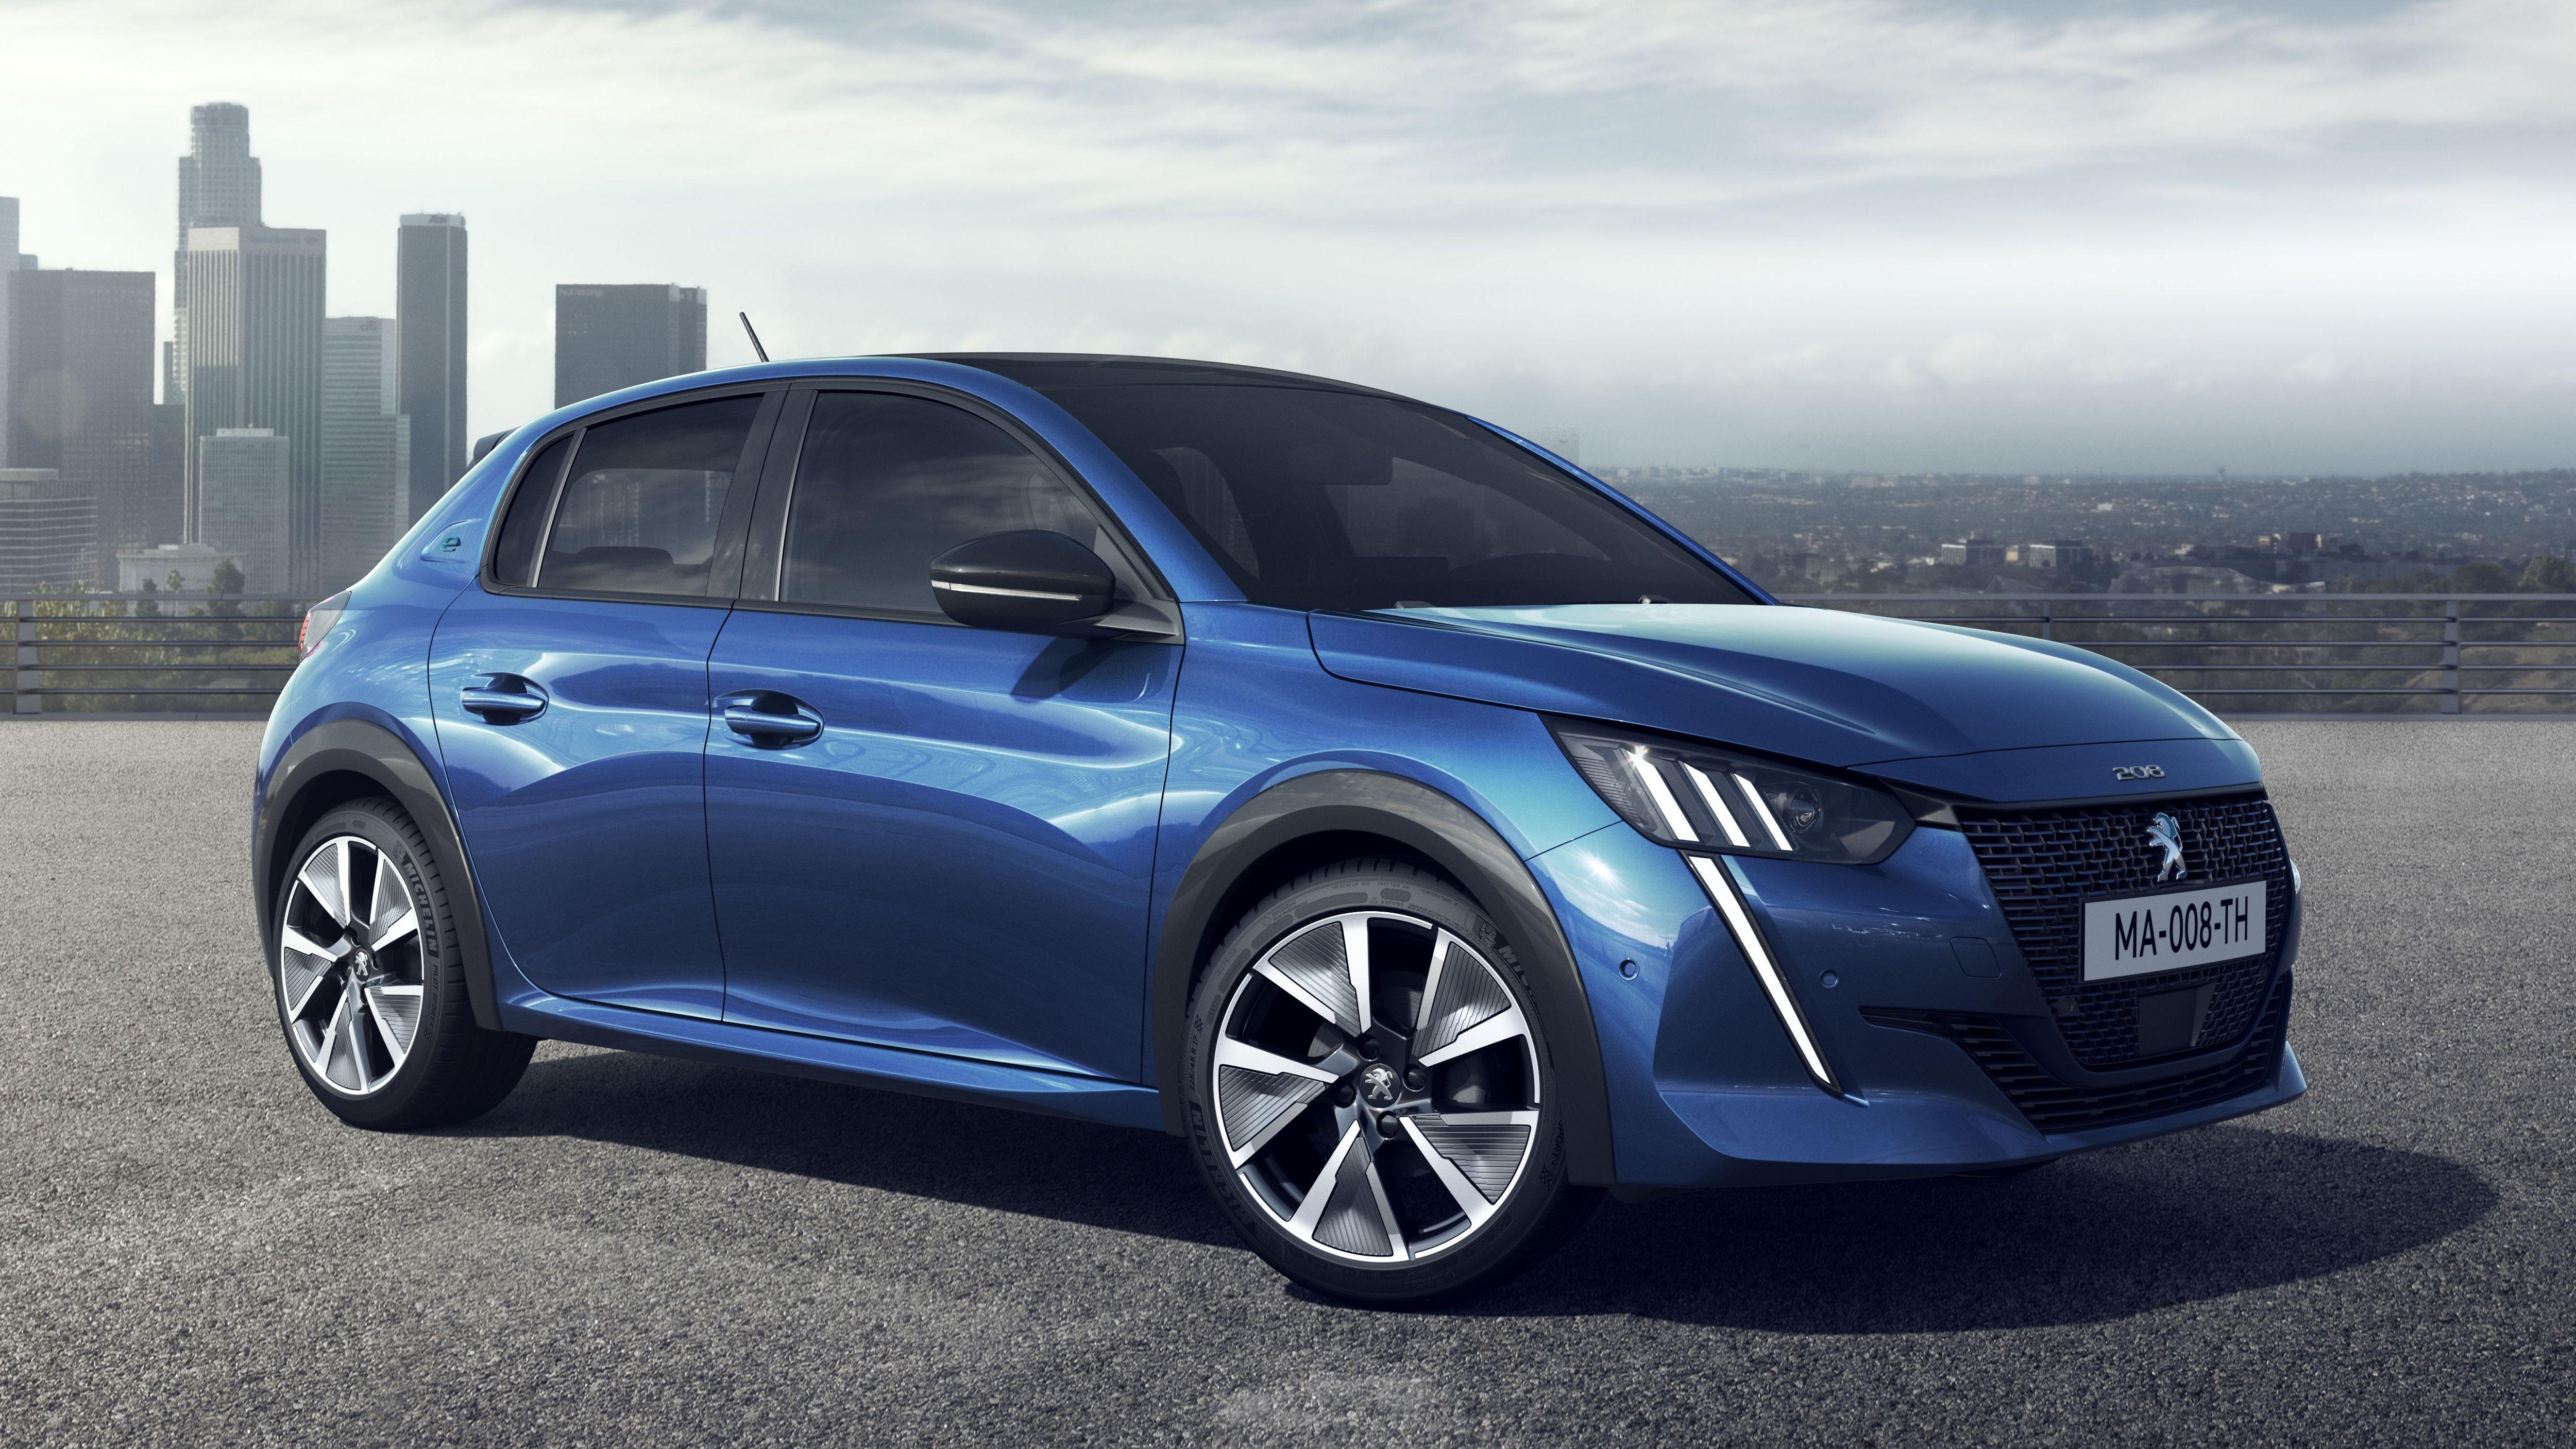 2019 Peugeot 208 Peugeot Electric Cars Geneva Motor Show